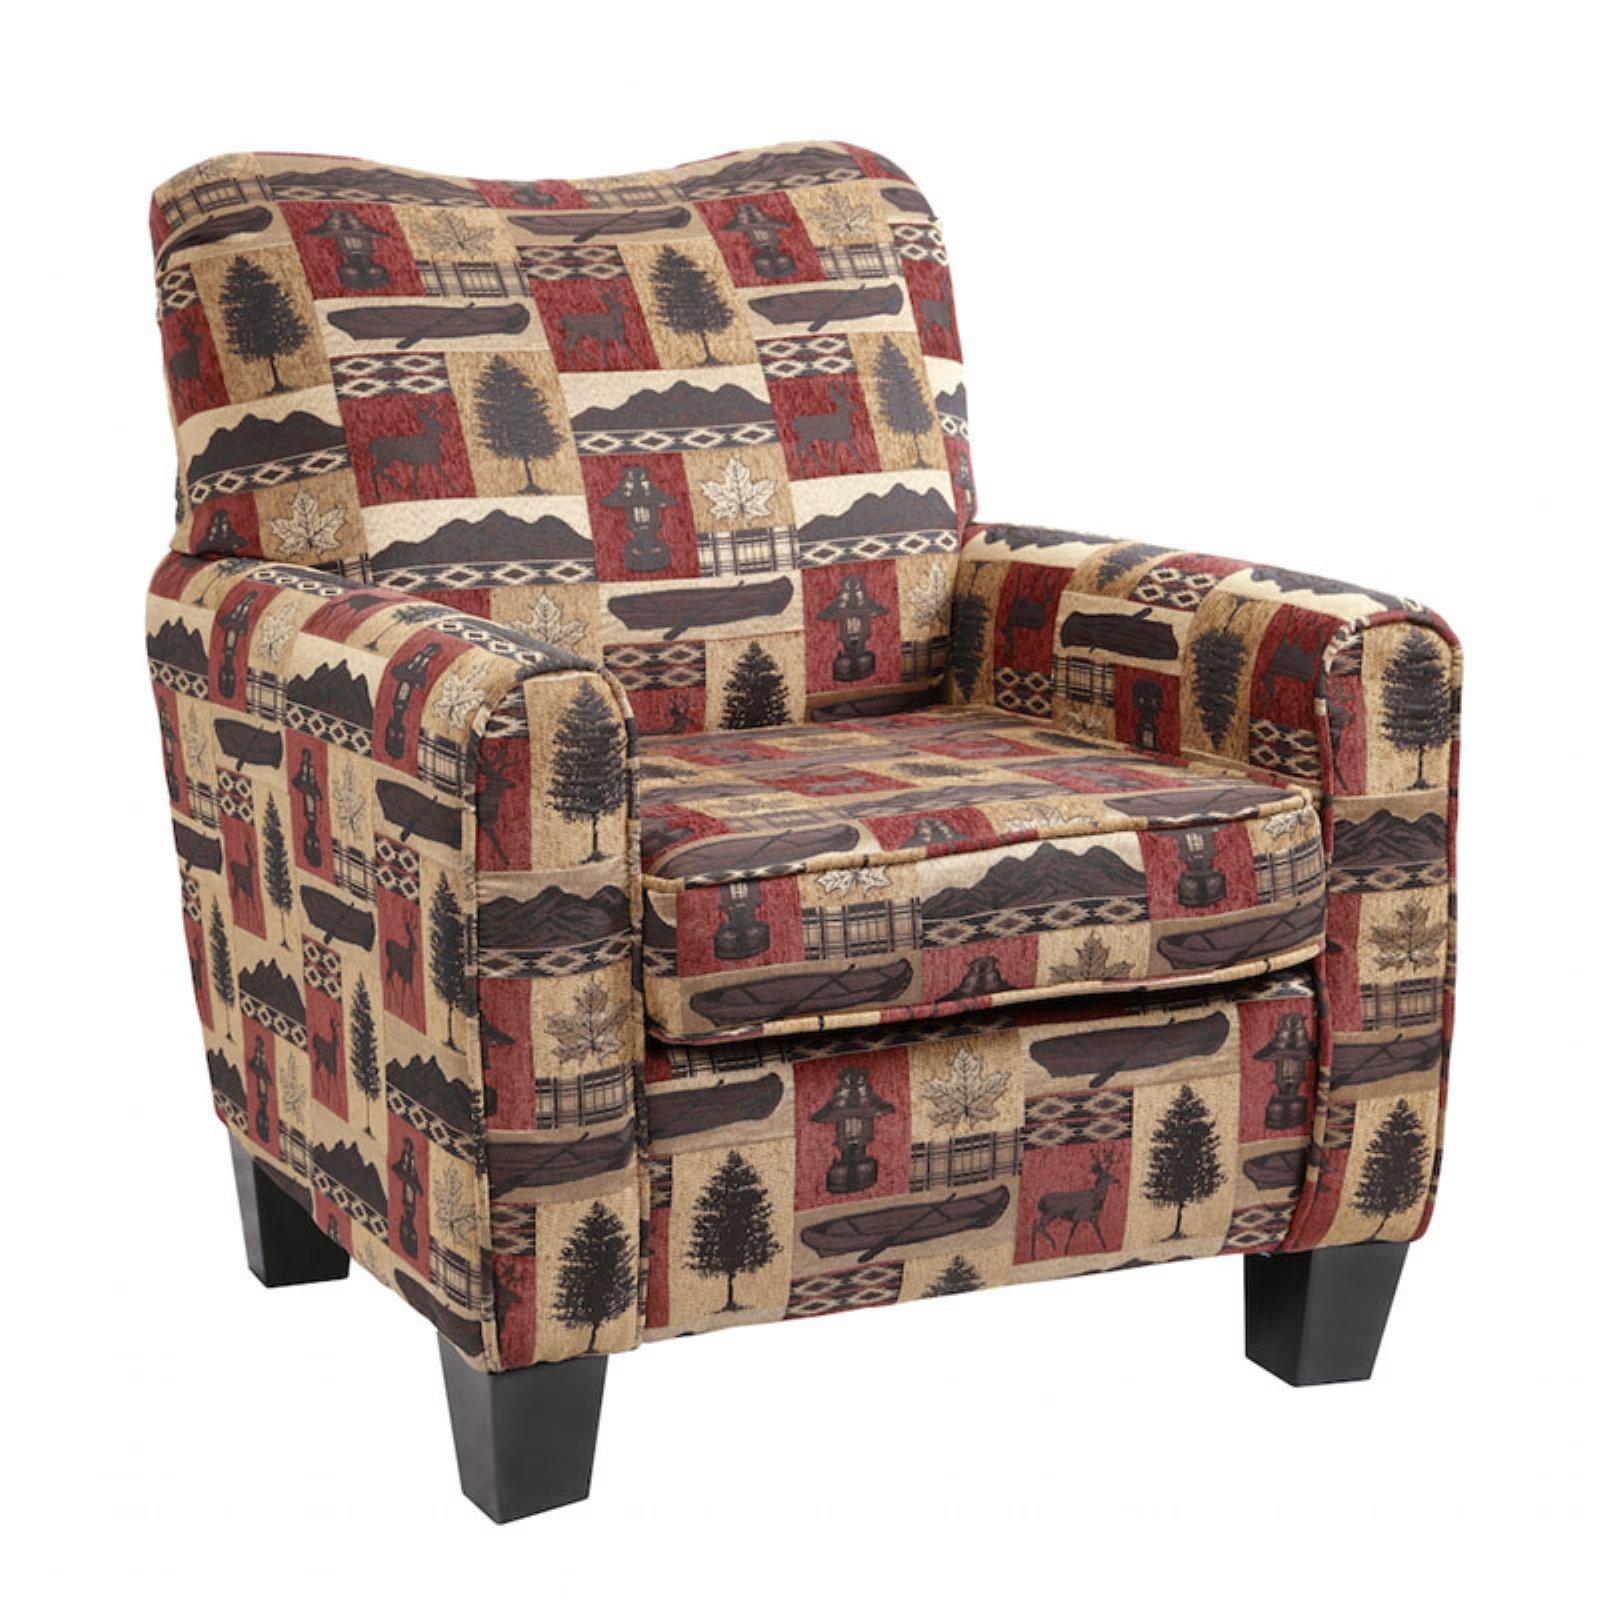 American Furniture Classics Lantern Lodge Hunting Cabin Club Chair